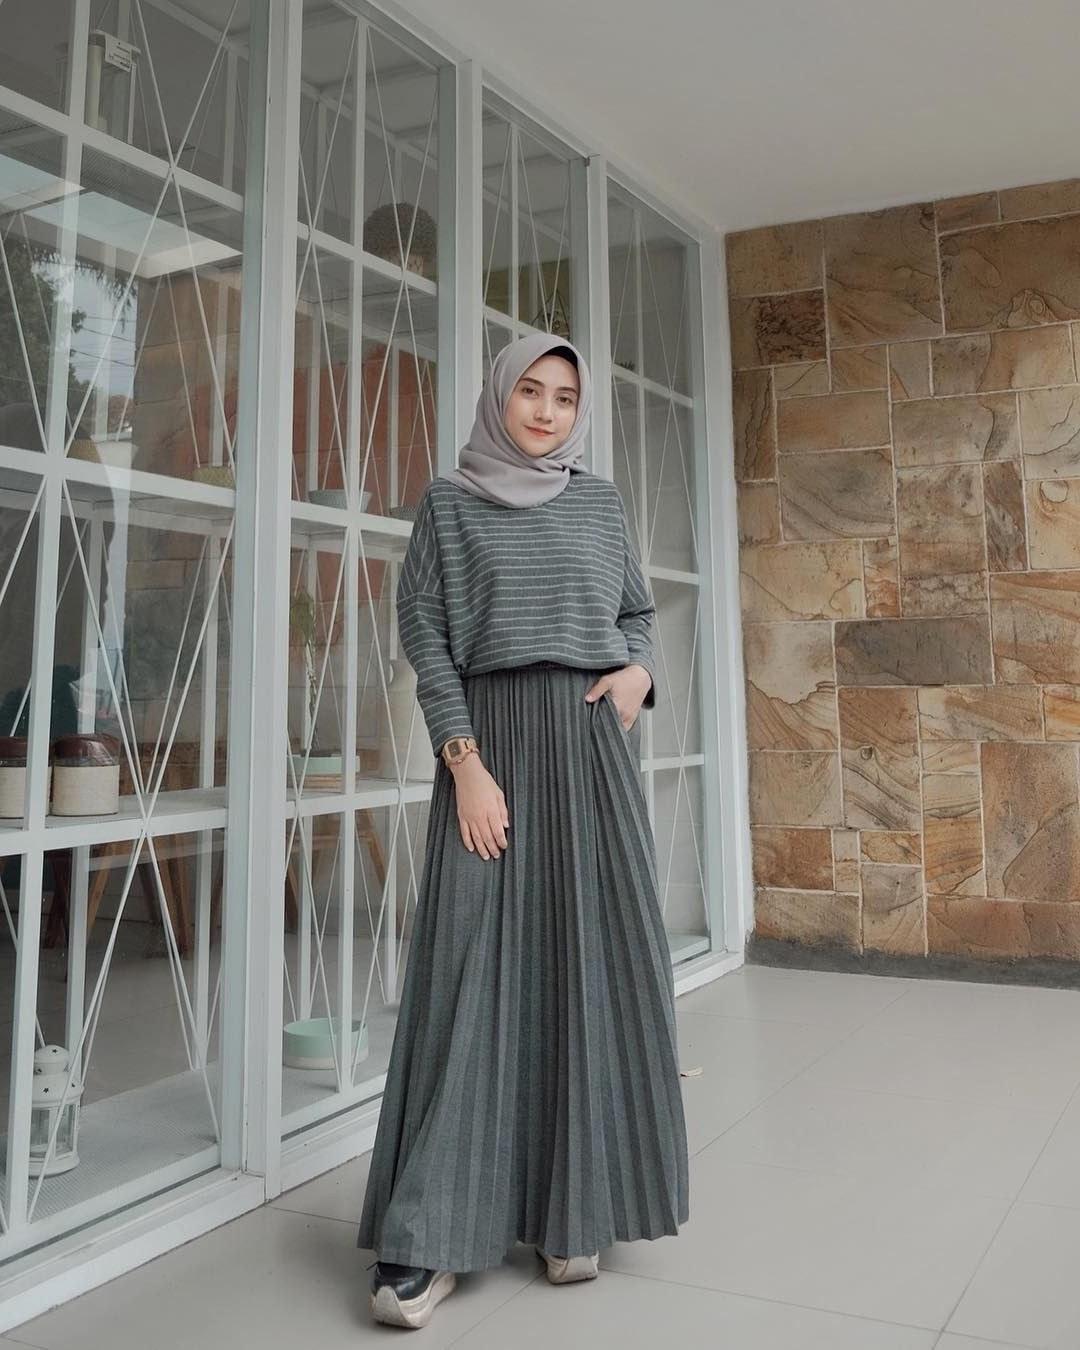 Inspirasi Baju Lebaran Thn 2019 87dx Baju Muslim Lebaran Terbaru 2019 Dengan Gambar